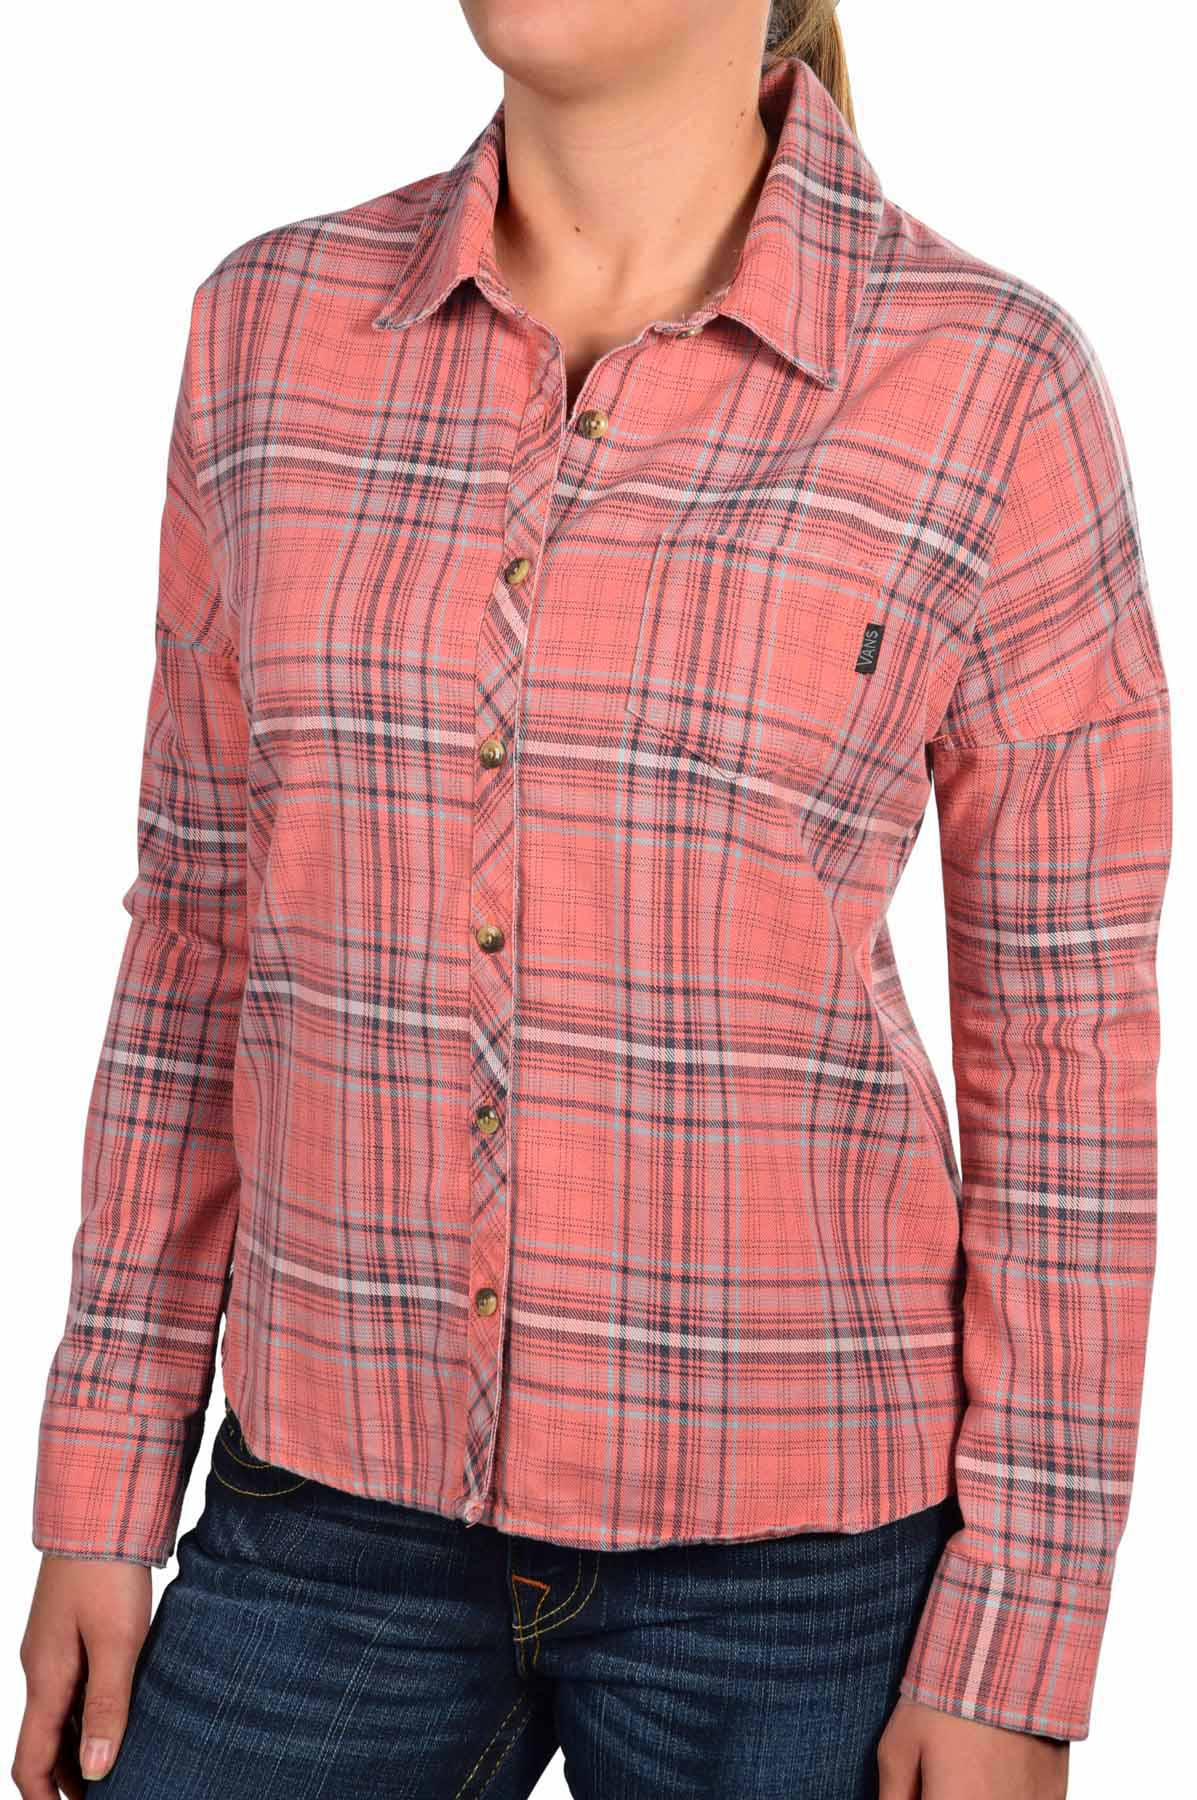 Vans Women 39 S Pledge Plaid Long Sleeve Button Down Shirt